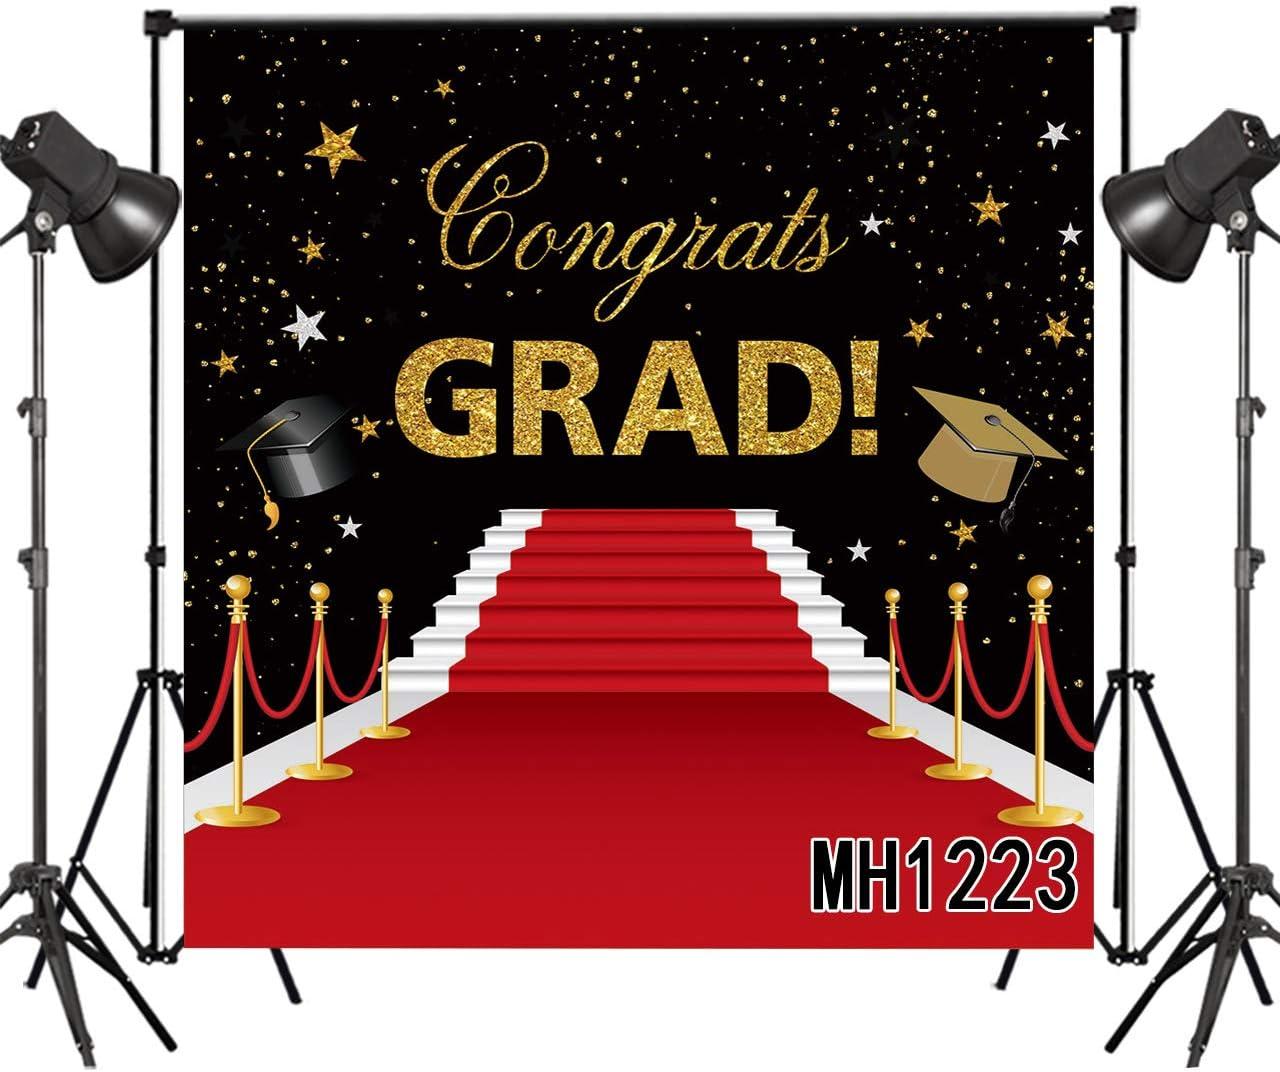 LB Graduation Ceremony Backdrop for Photography 10x10ft Red Carpet Backdrop Congrats Grad Graduation Party Cap Design Photo Background Customized Photoshoot Studio Props MH1223